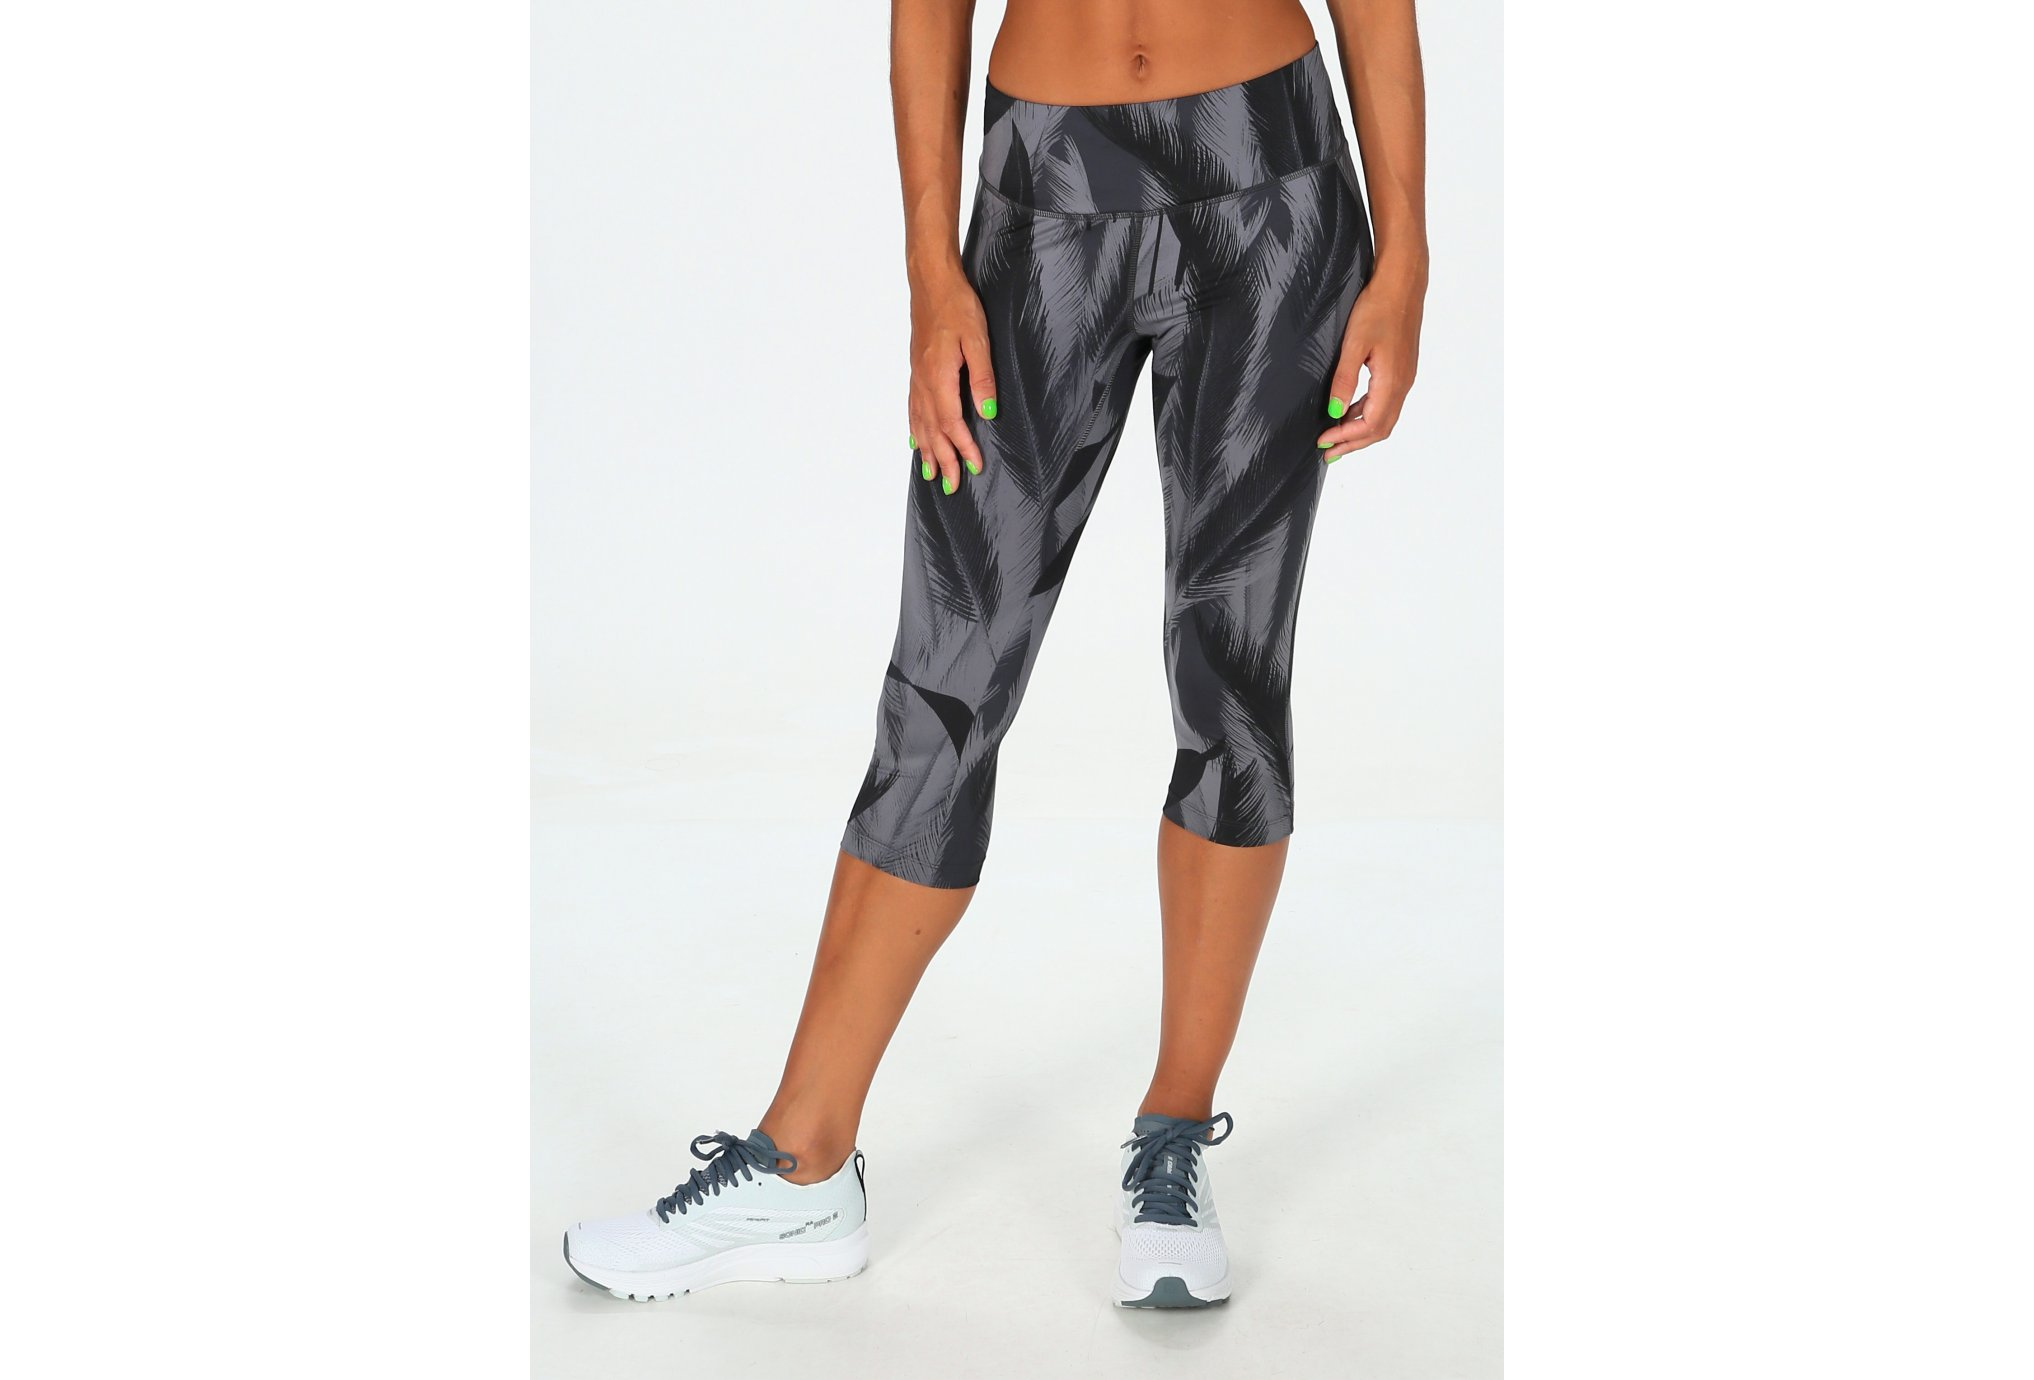 Salomon Mallas 3/4 Agile vêtement running femme